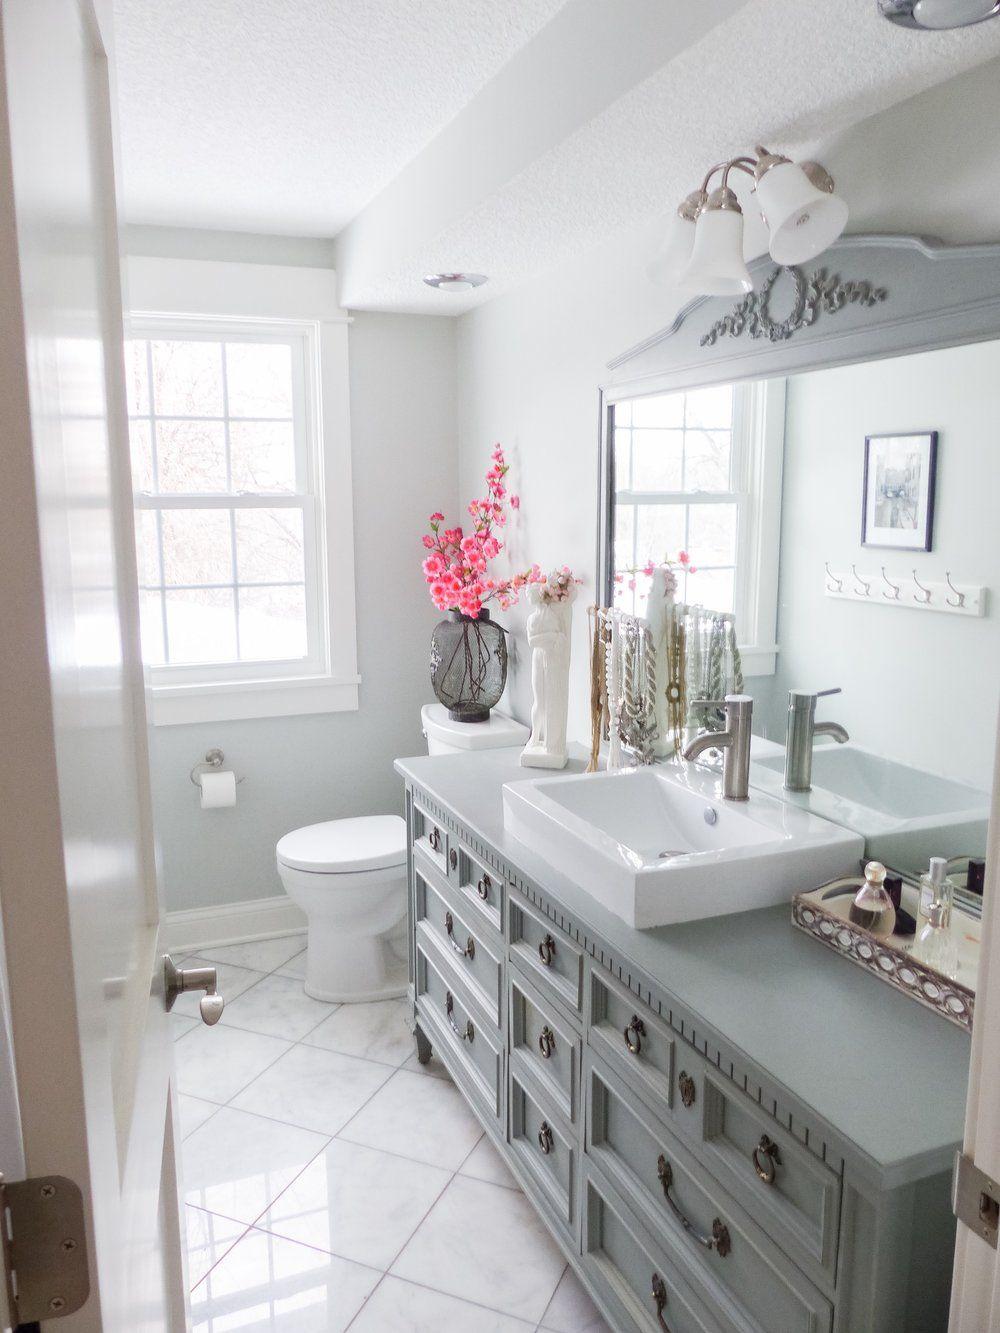 budget friendly bathroom makeover diy bathroom decor on bathroom renovation ideas diy id=14432